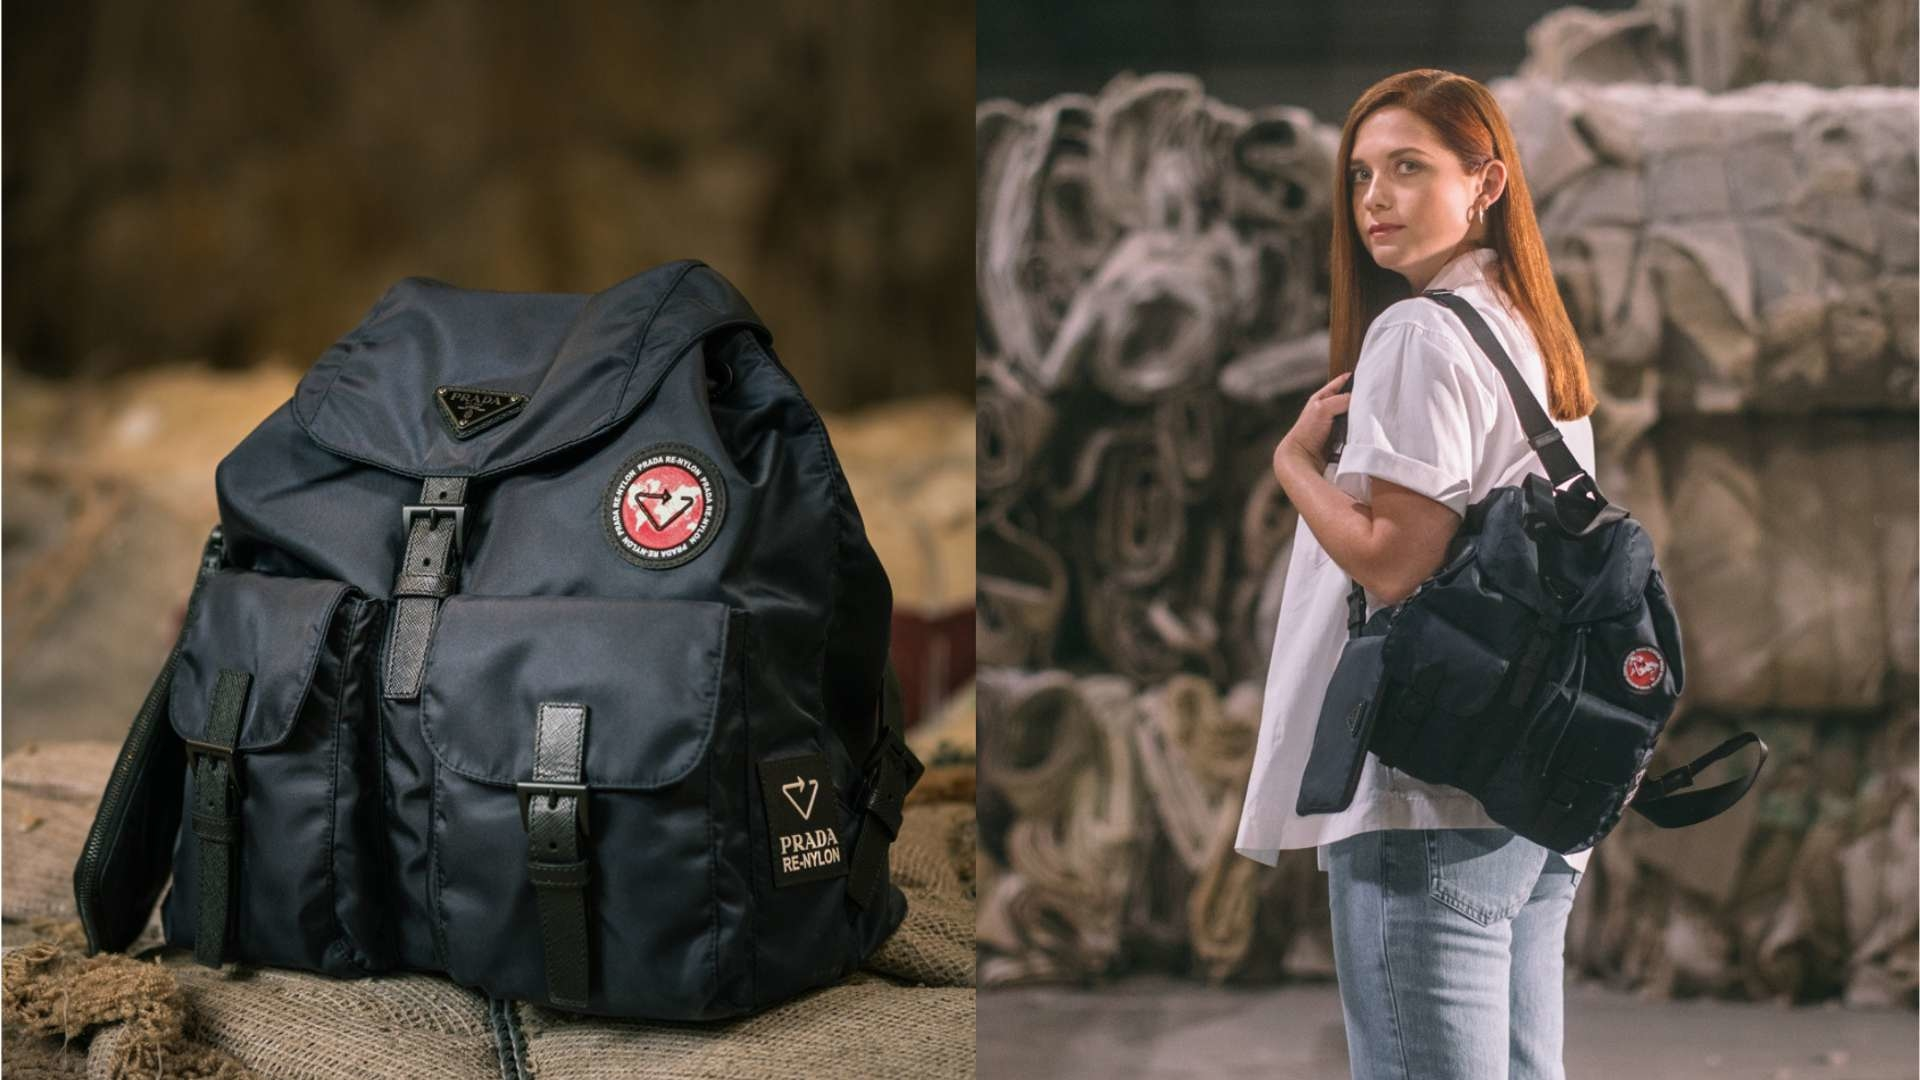 Prada Has Recreated Their Signature Nylon Bag Made From Plastic Bottles